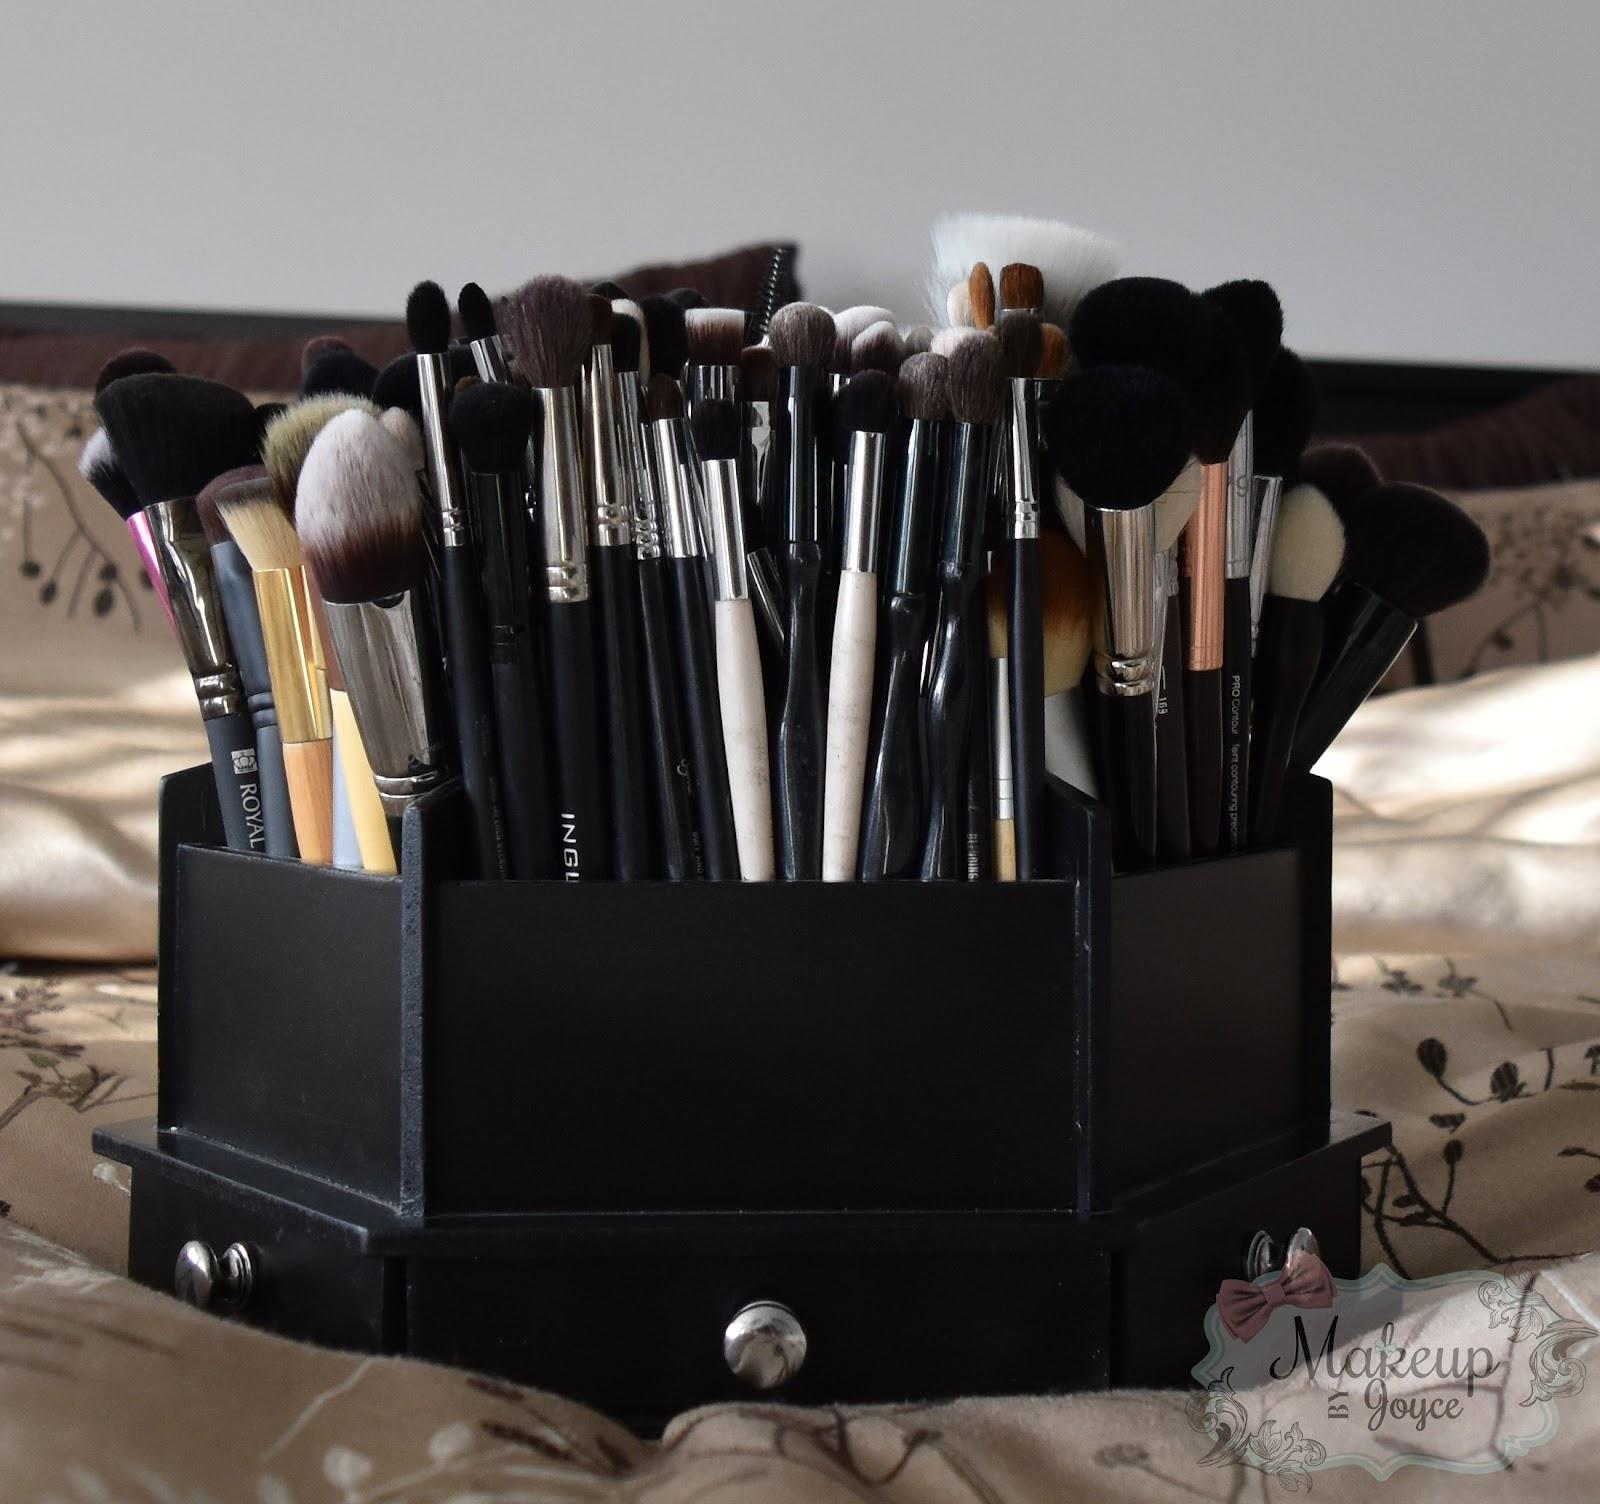 MakeupByJoyce ** !: Storage Solution for Makeup Brushes ...